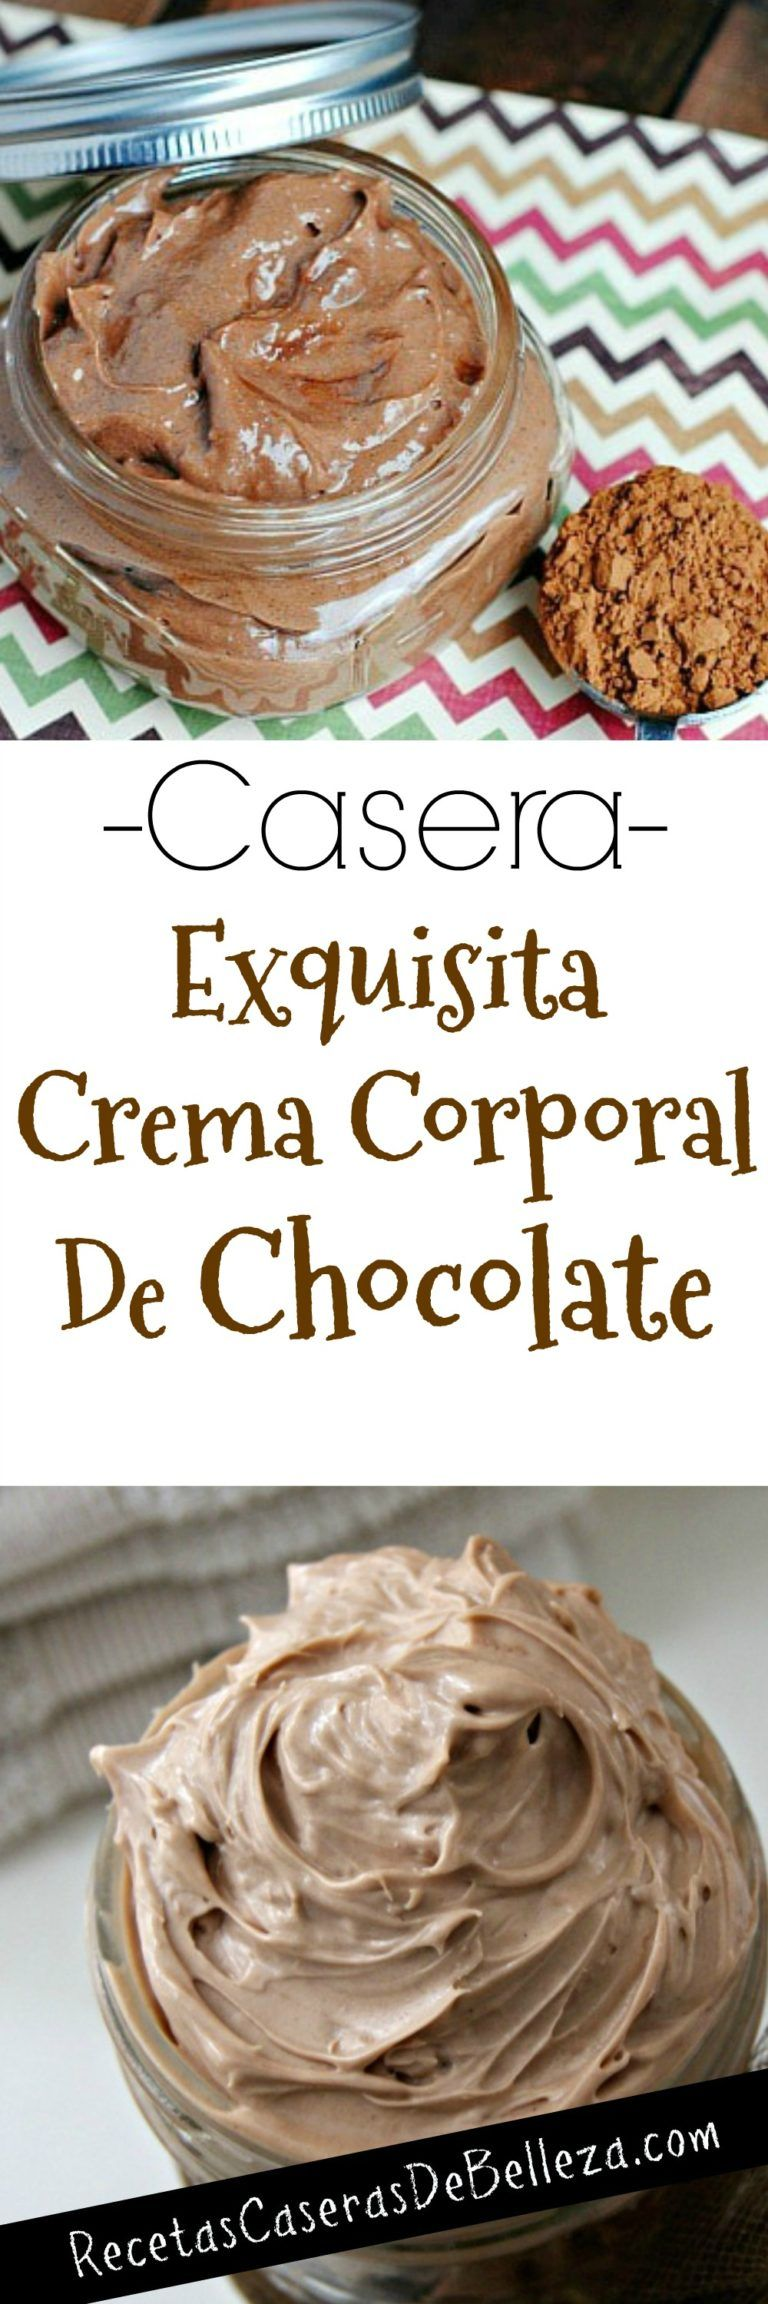 Crema Corporal Casera de Chocolate